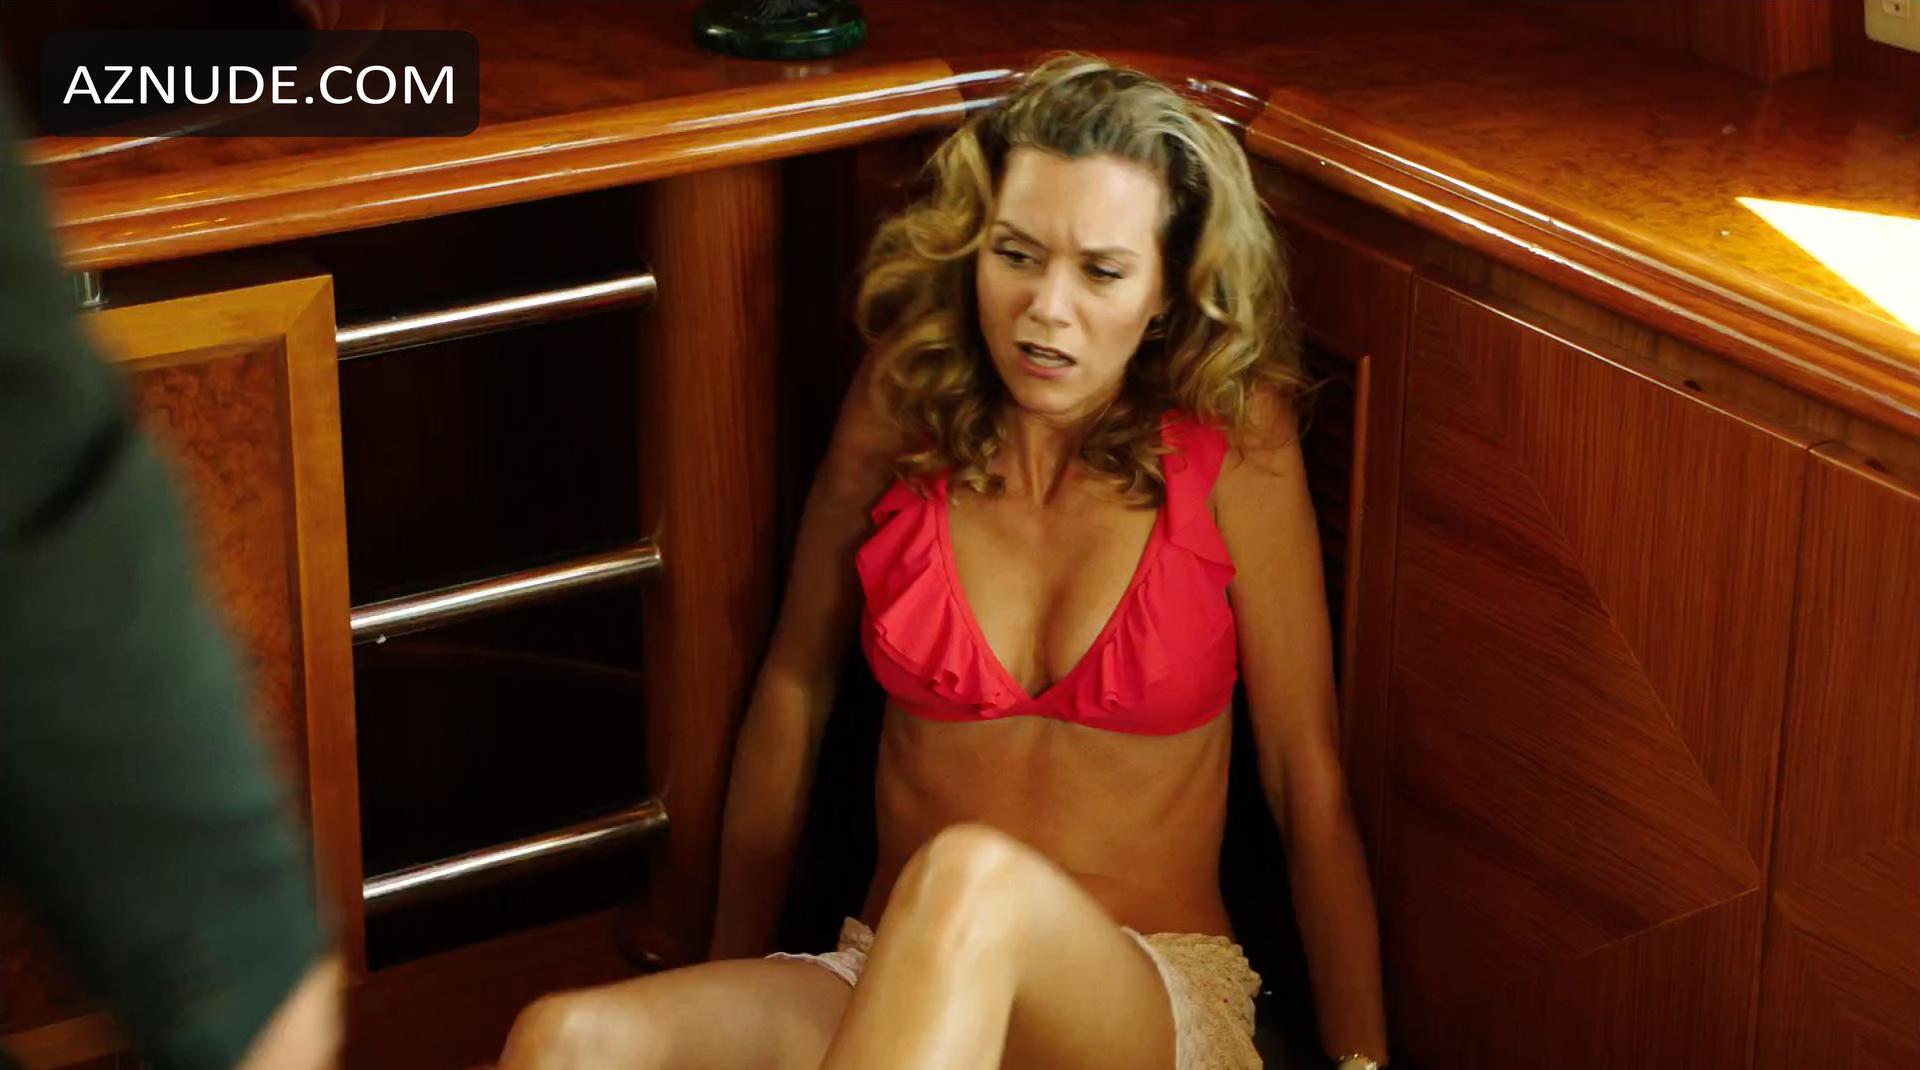 Amelia heinle liars poker topless 5